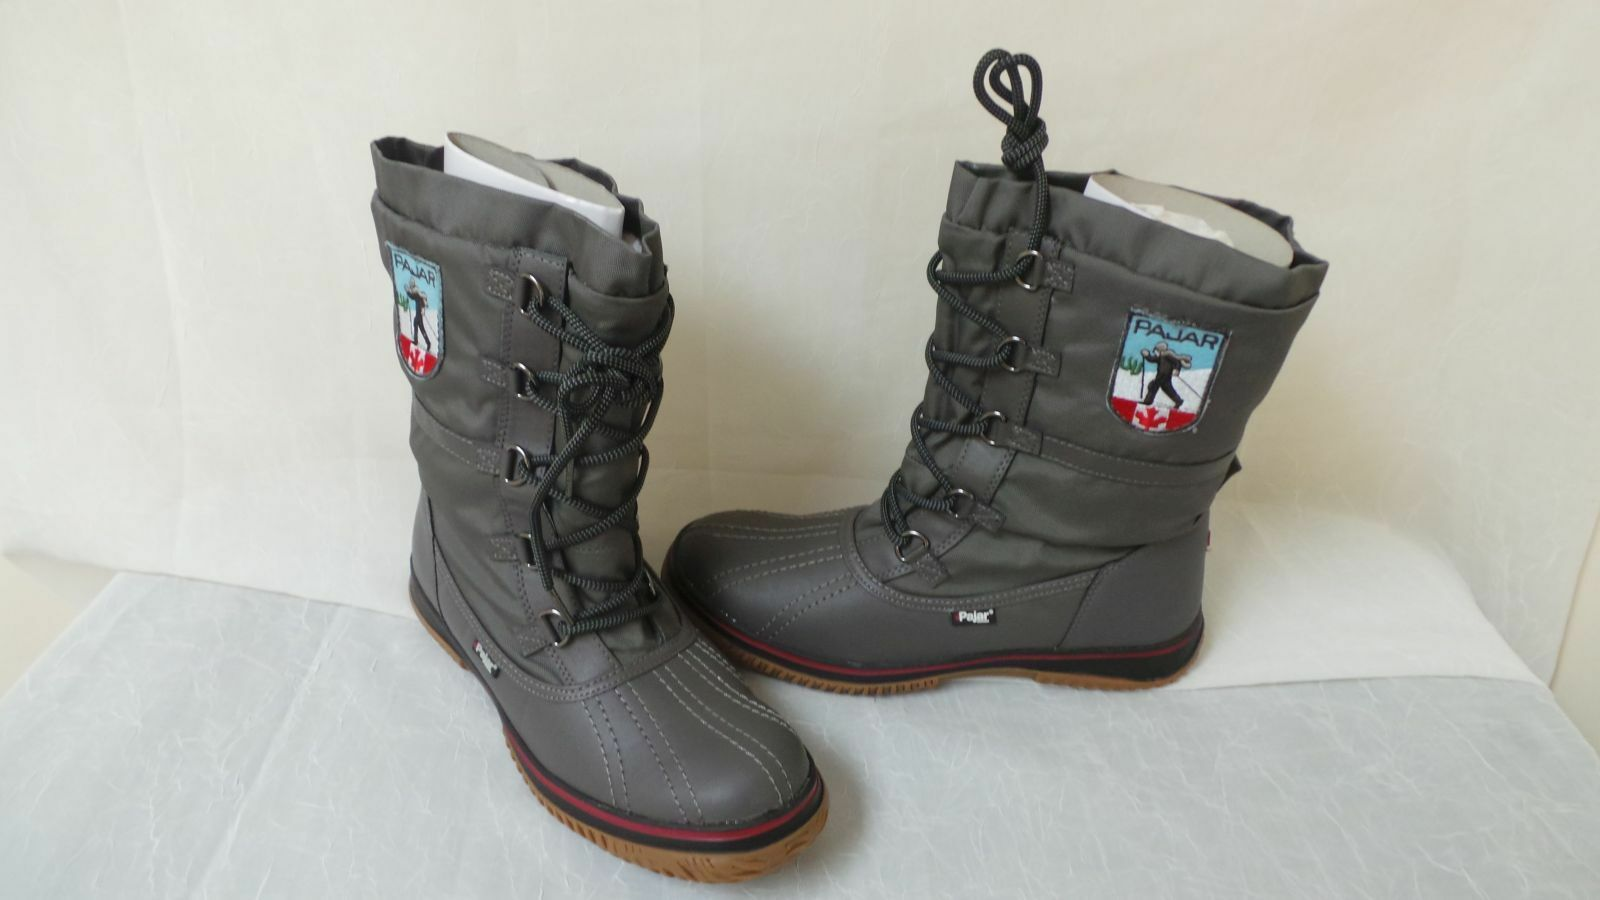 New! Pajar Womens Grip Low Low Grip Winter Boots-Size 11-Gray   W137    la 40cc58